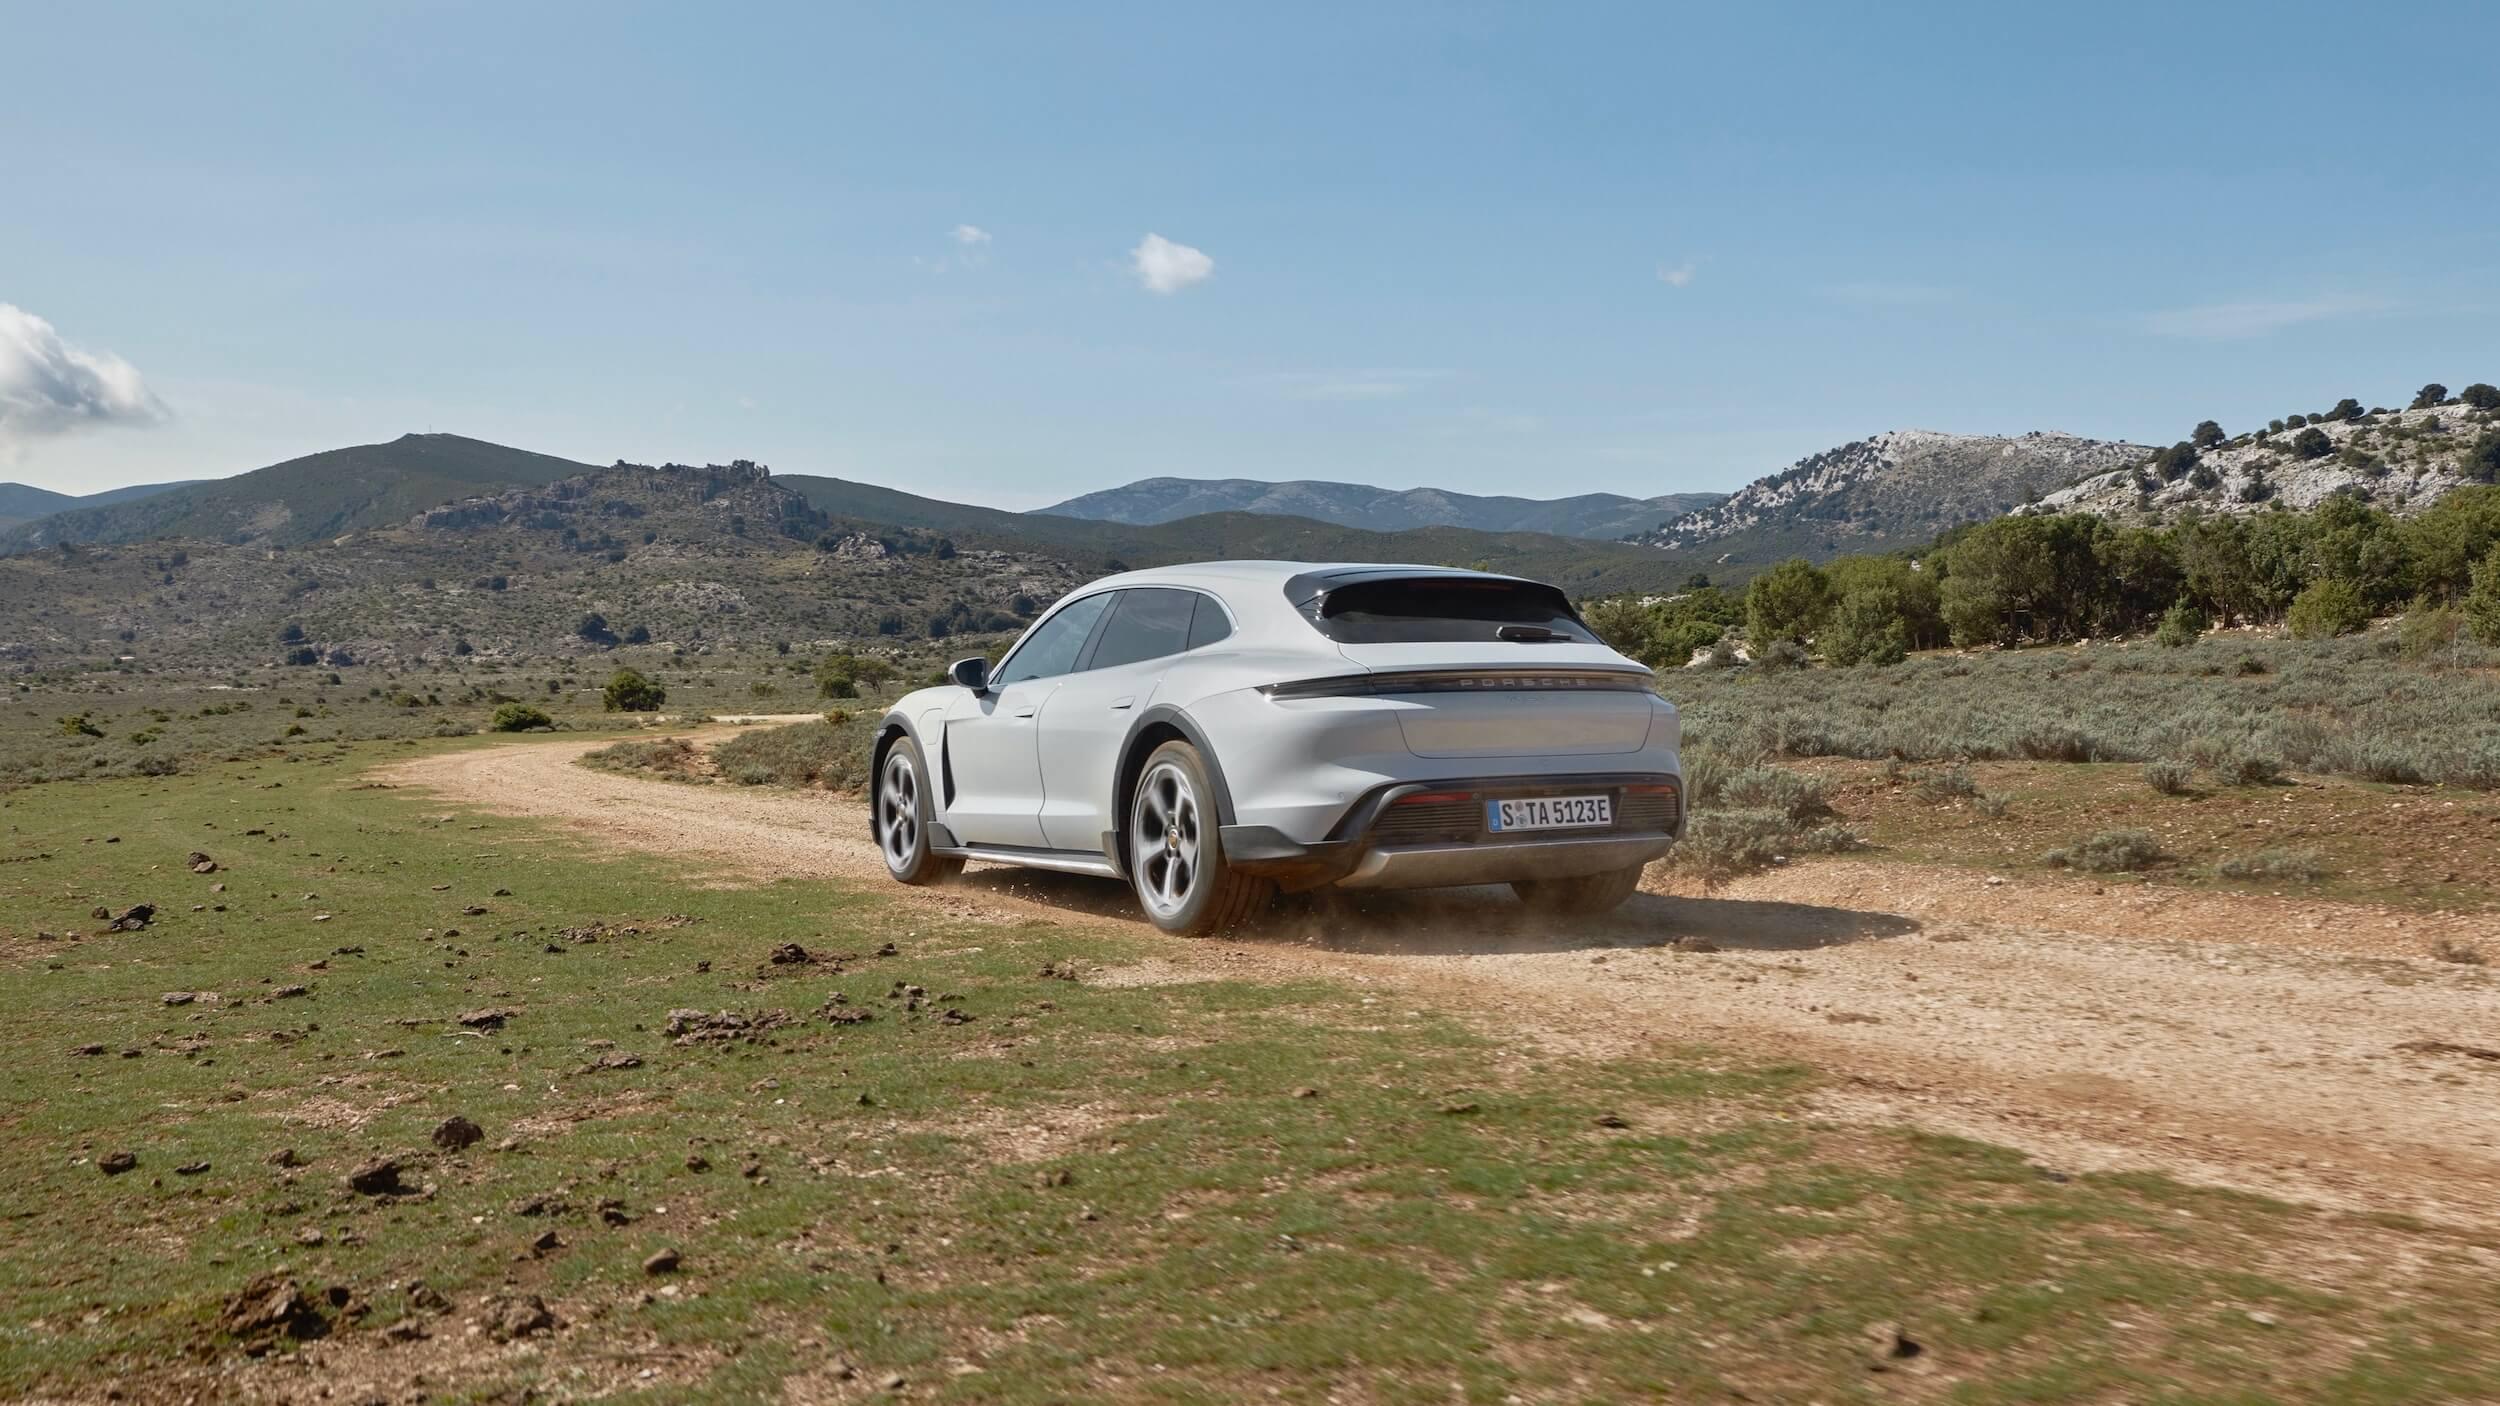 Porsche Taycan 4S Cross Turismo sand road